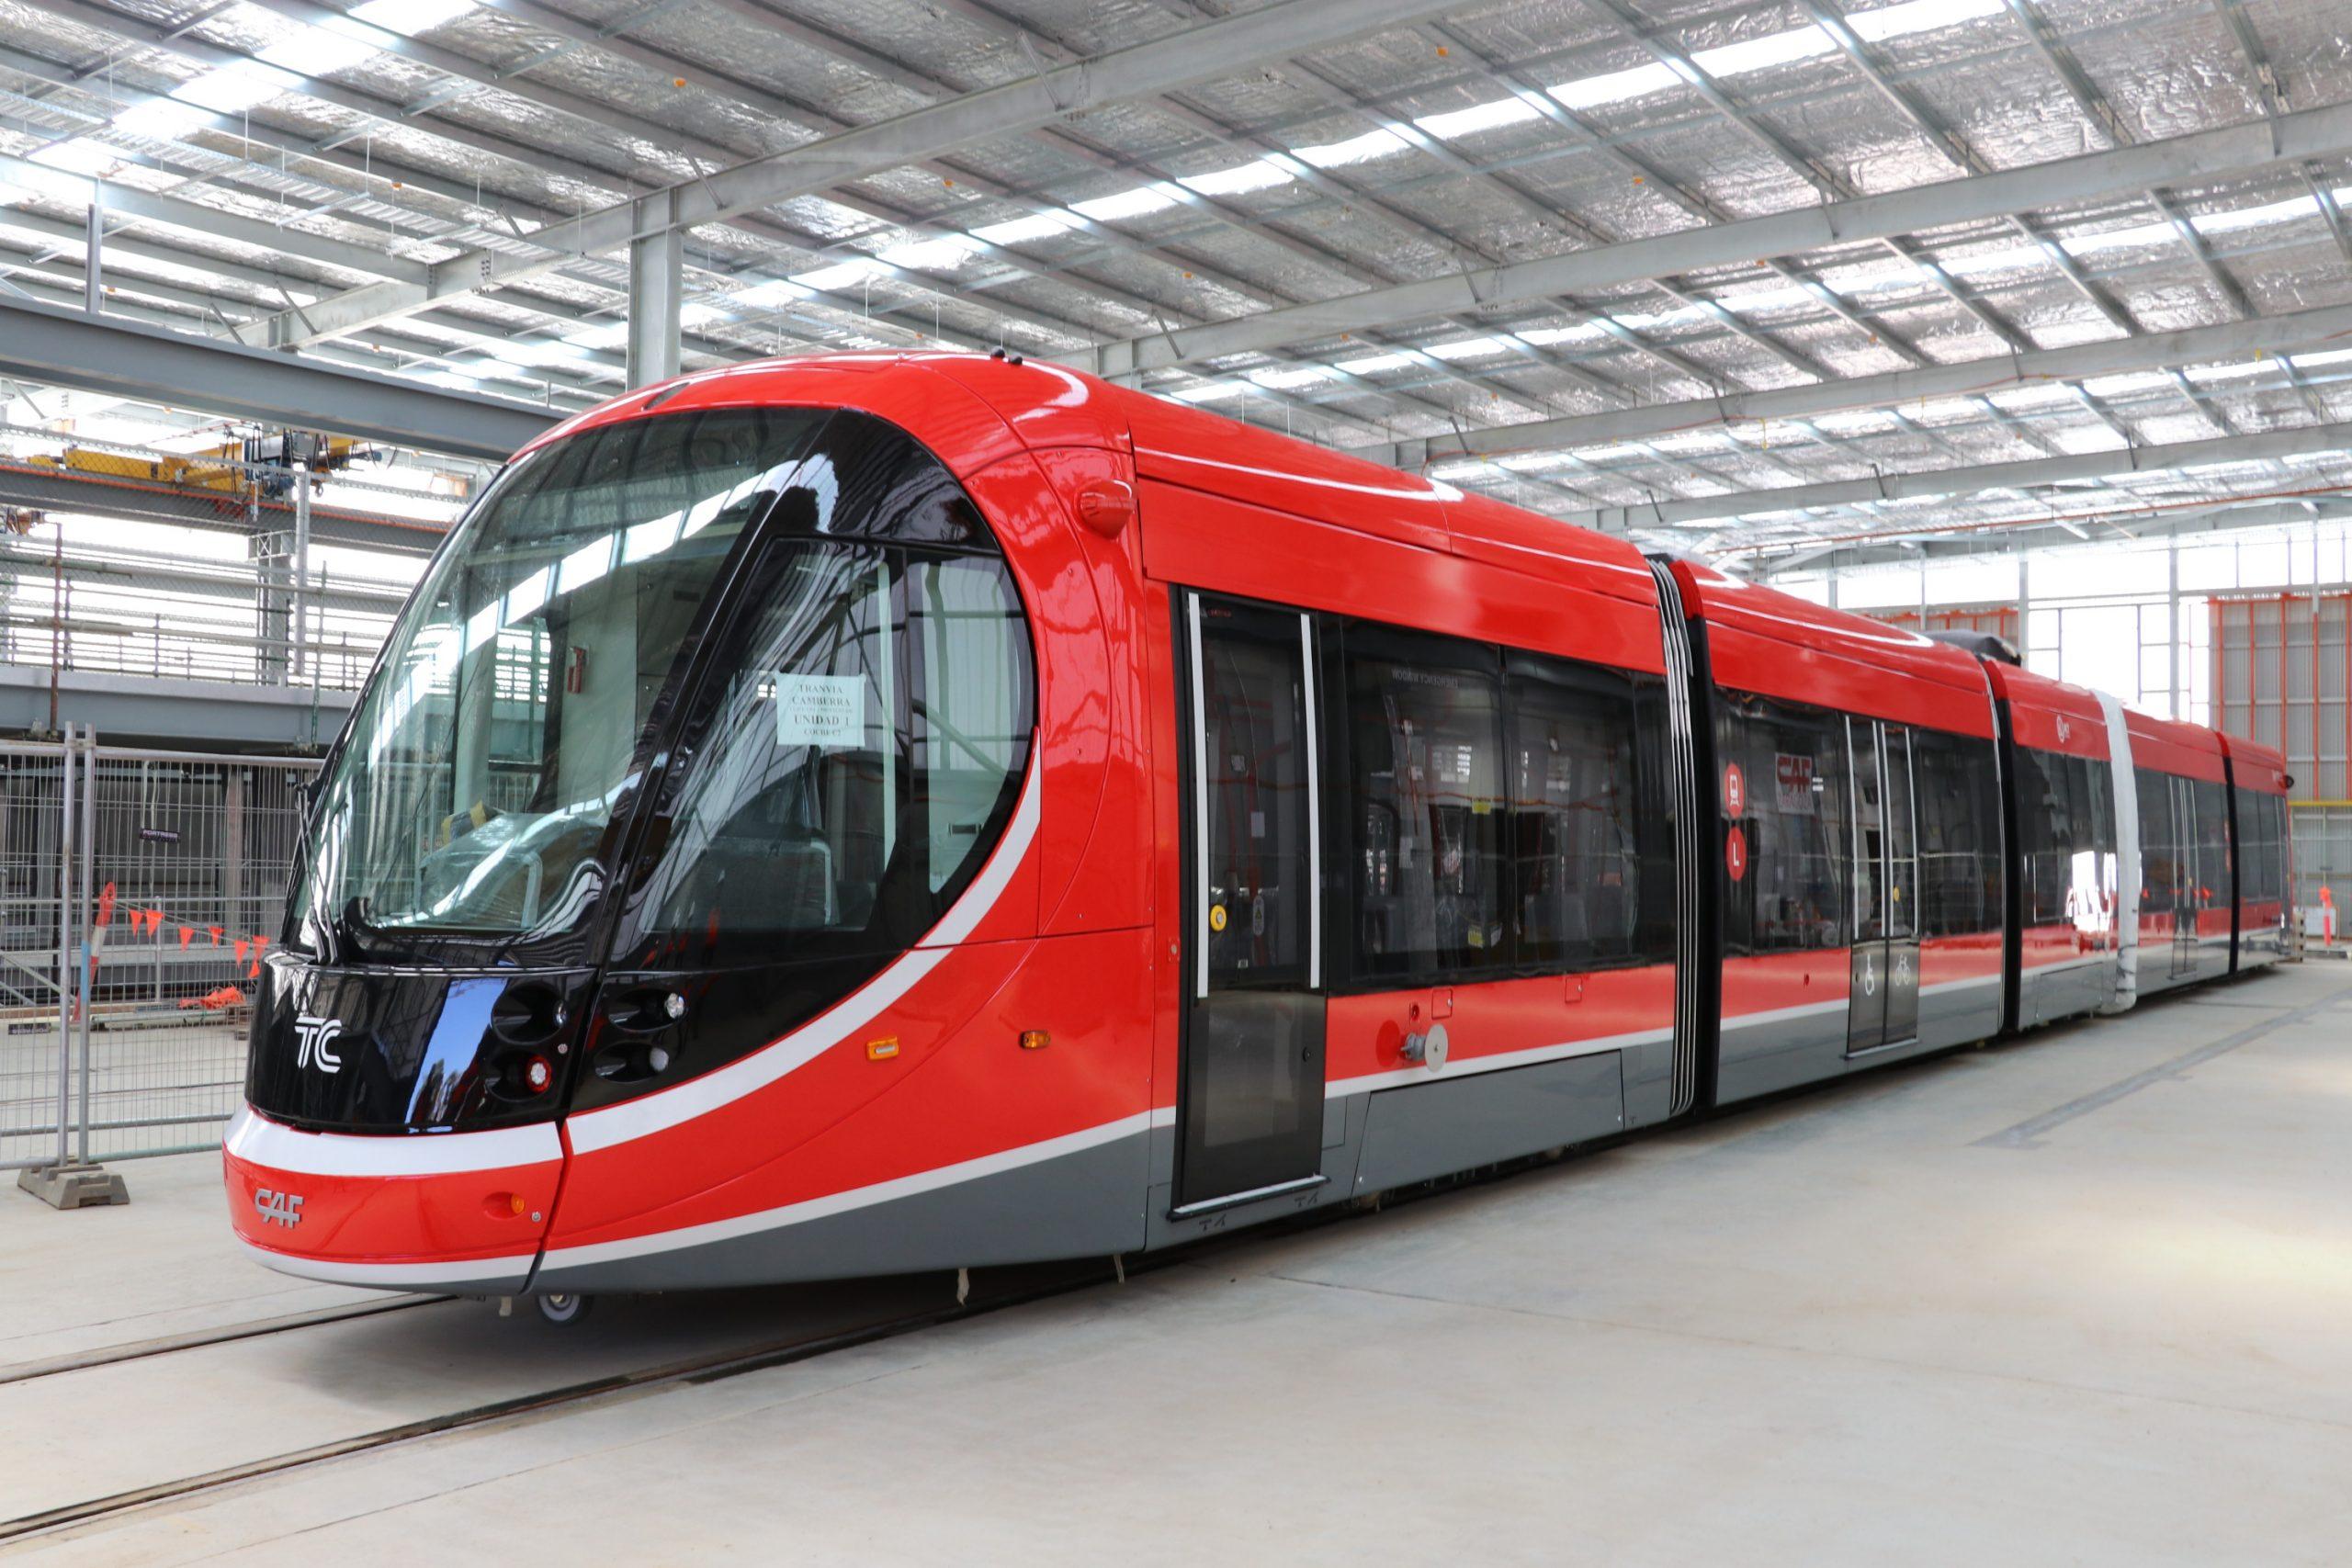 Canberra Light Rail Tram in Shed